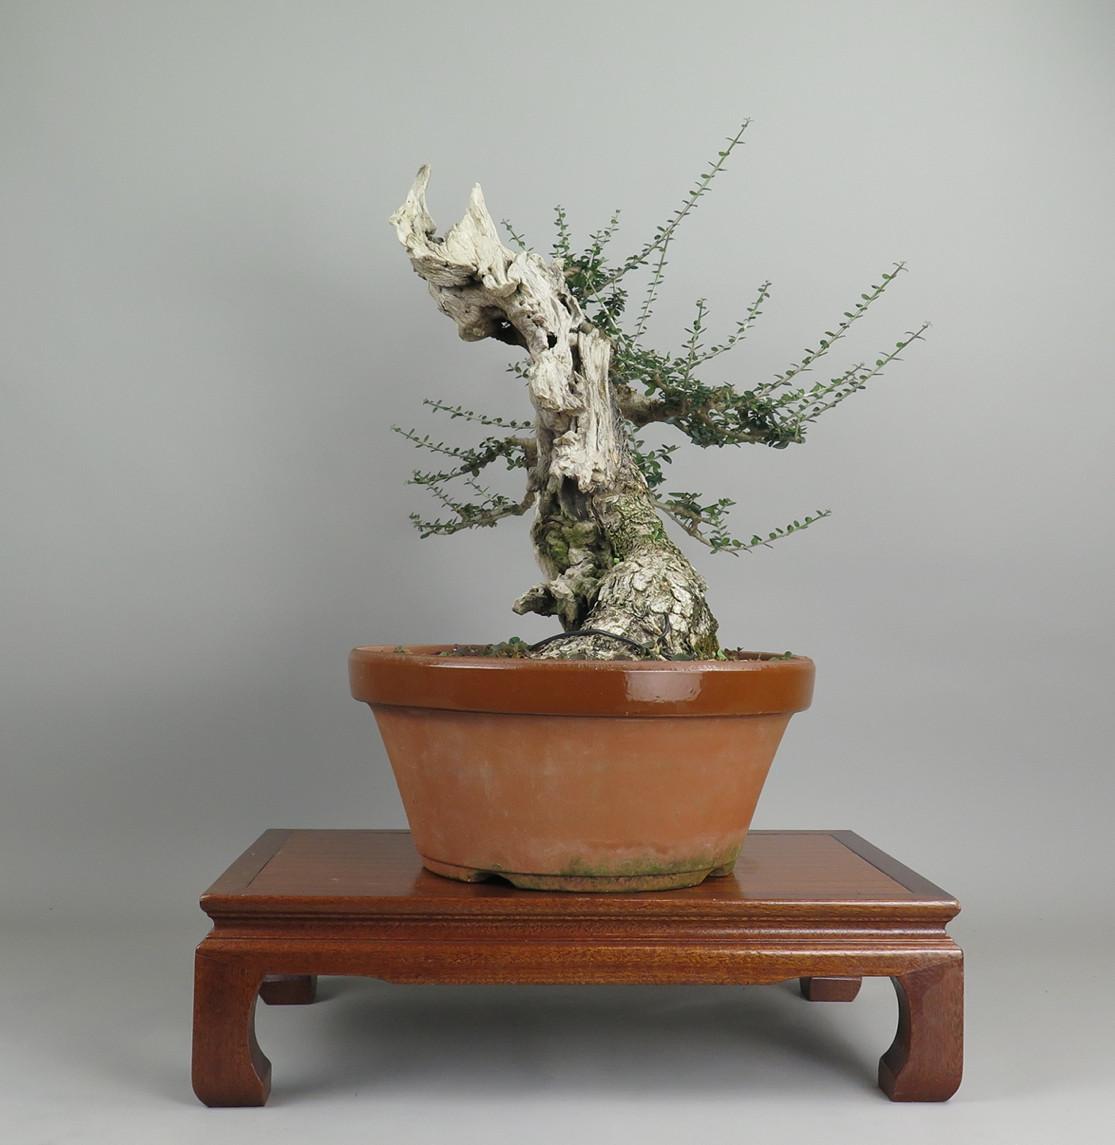 Bonsai de olivo, lateral izquierdo